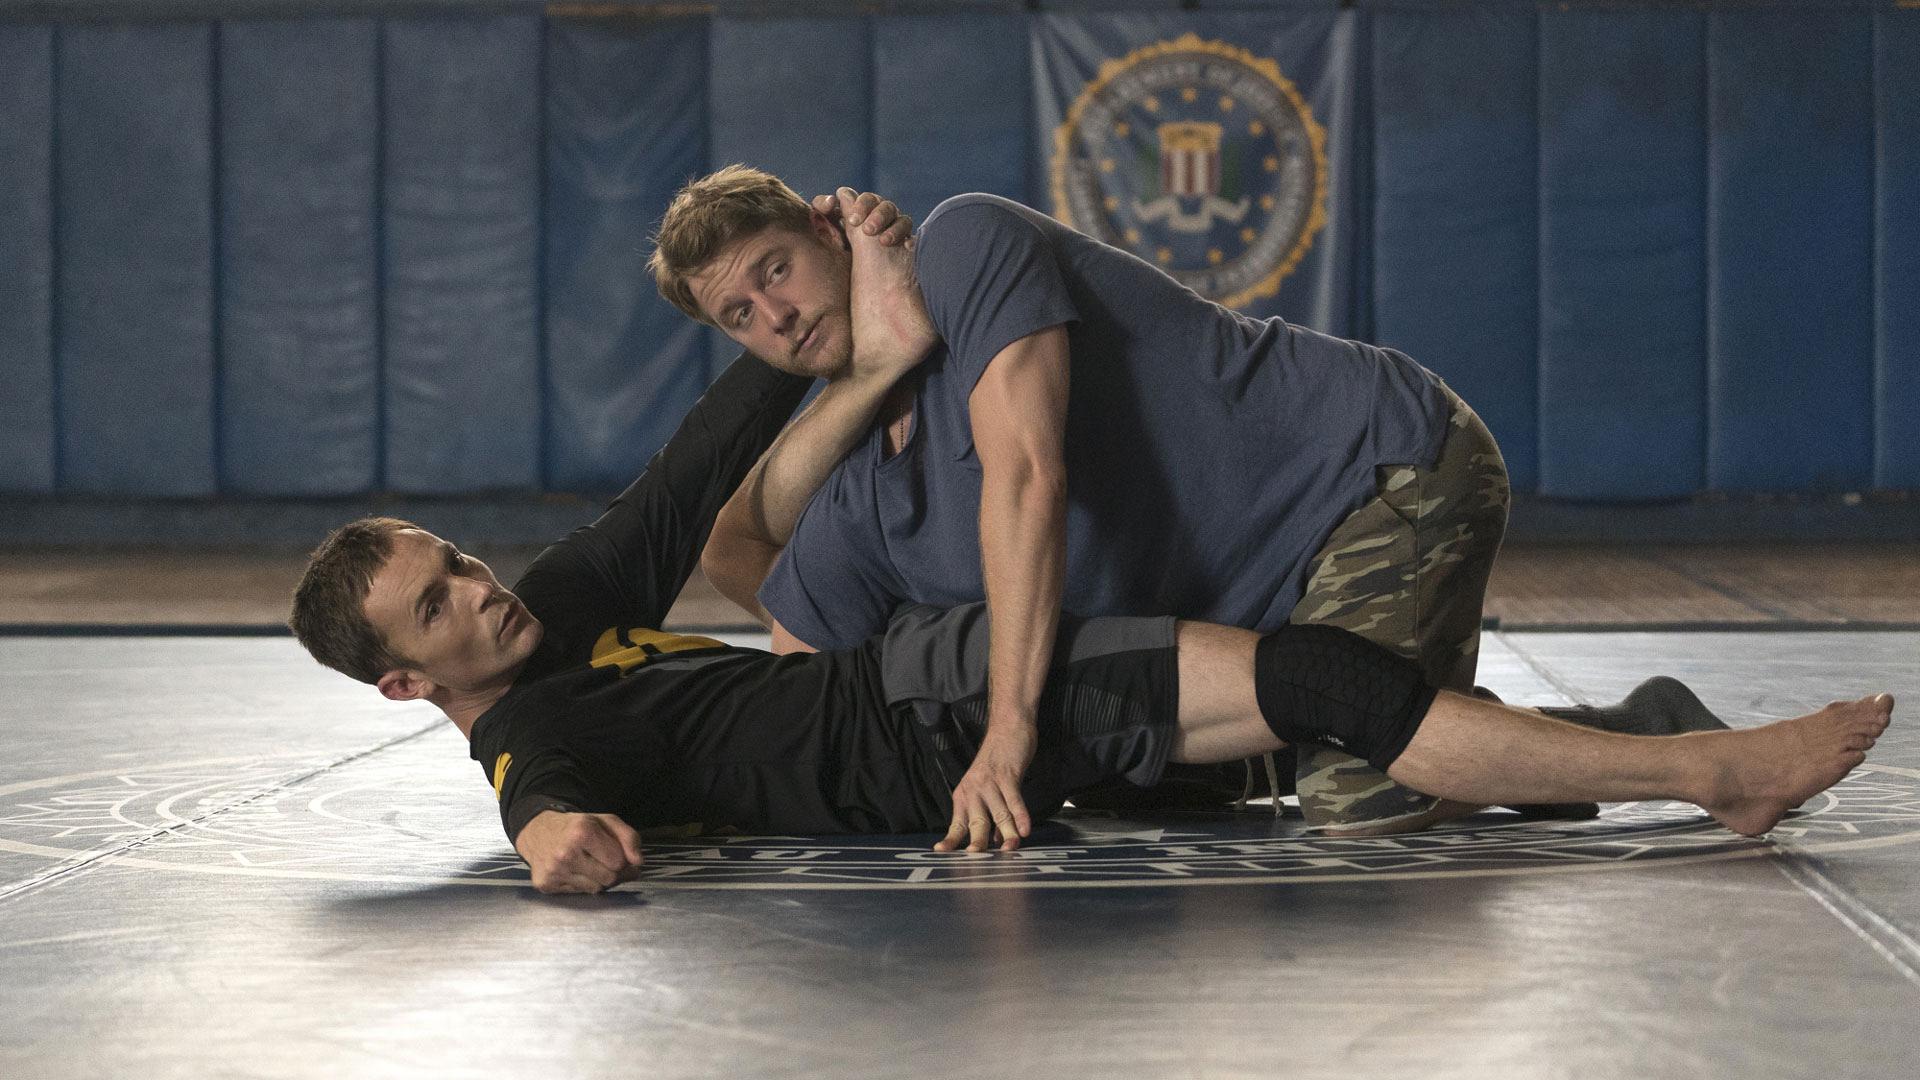 Desmond Harrington as Casey Rooks and Jake McDorman as Brian Finch